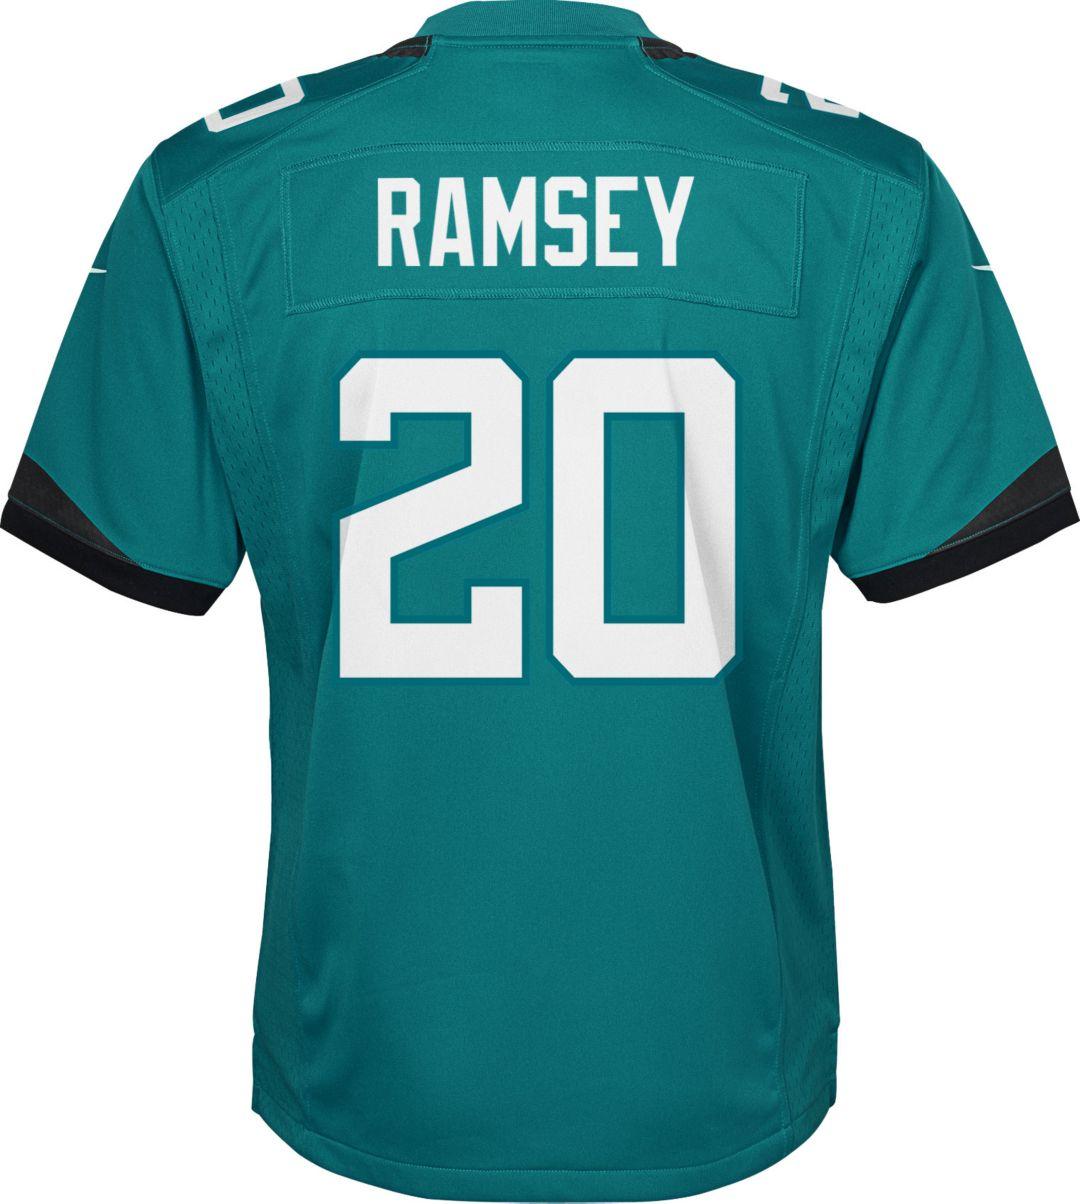 Discount Nike Youth Alternate Game Jersey Jacksonville Jaguars Jalen Ramsey  for sale